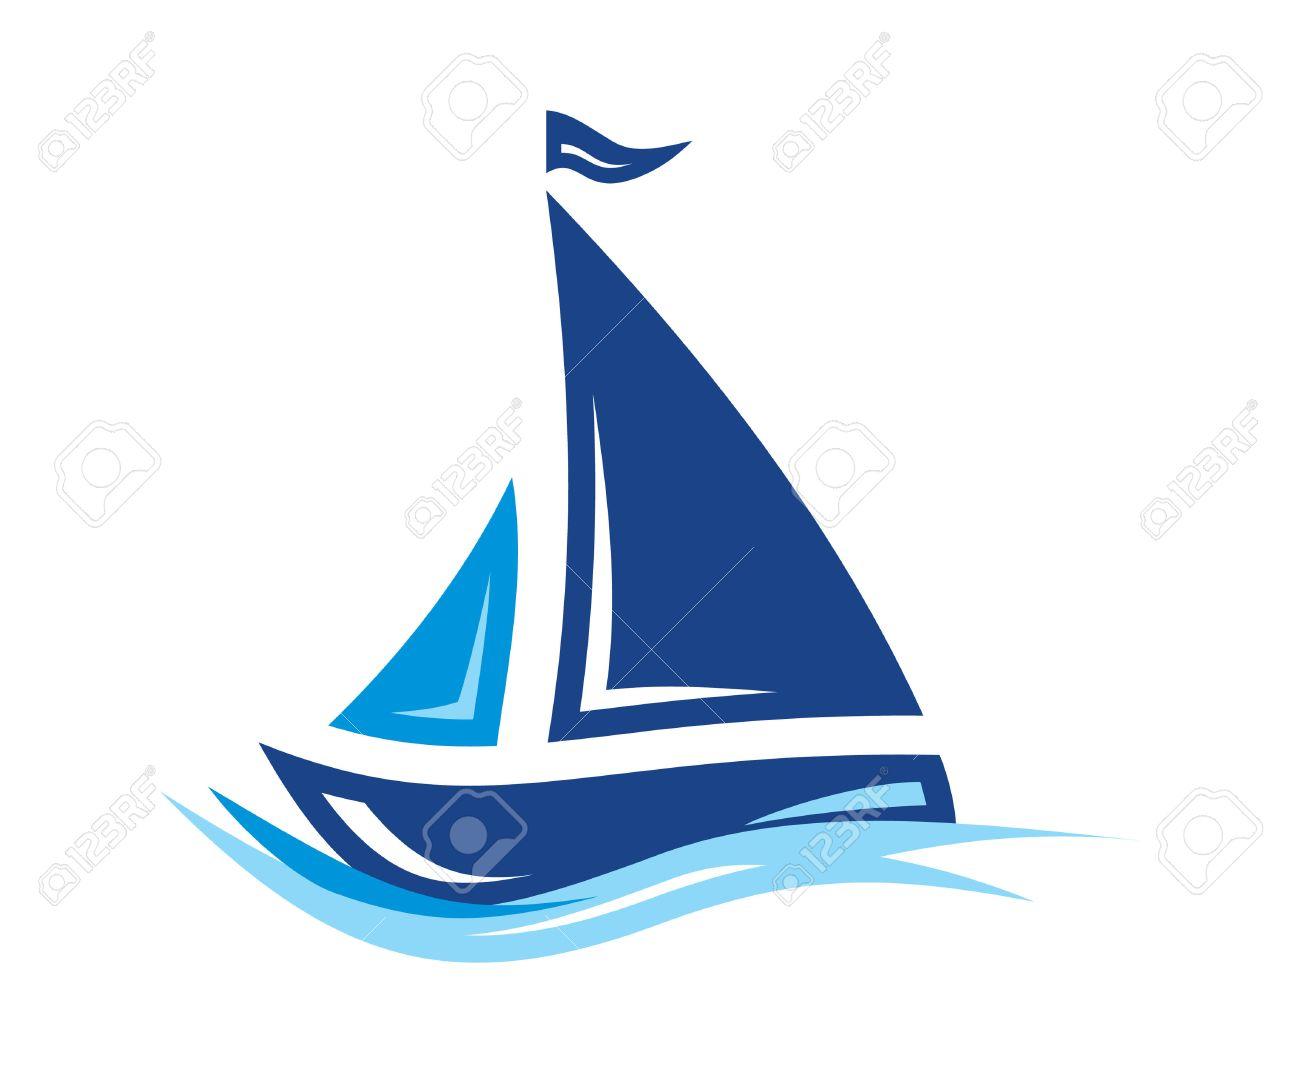 sailing boat vector icon royalty free cliparts vectors and stock rh 123rf com boat vector logo boat vector graphic